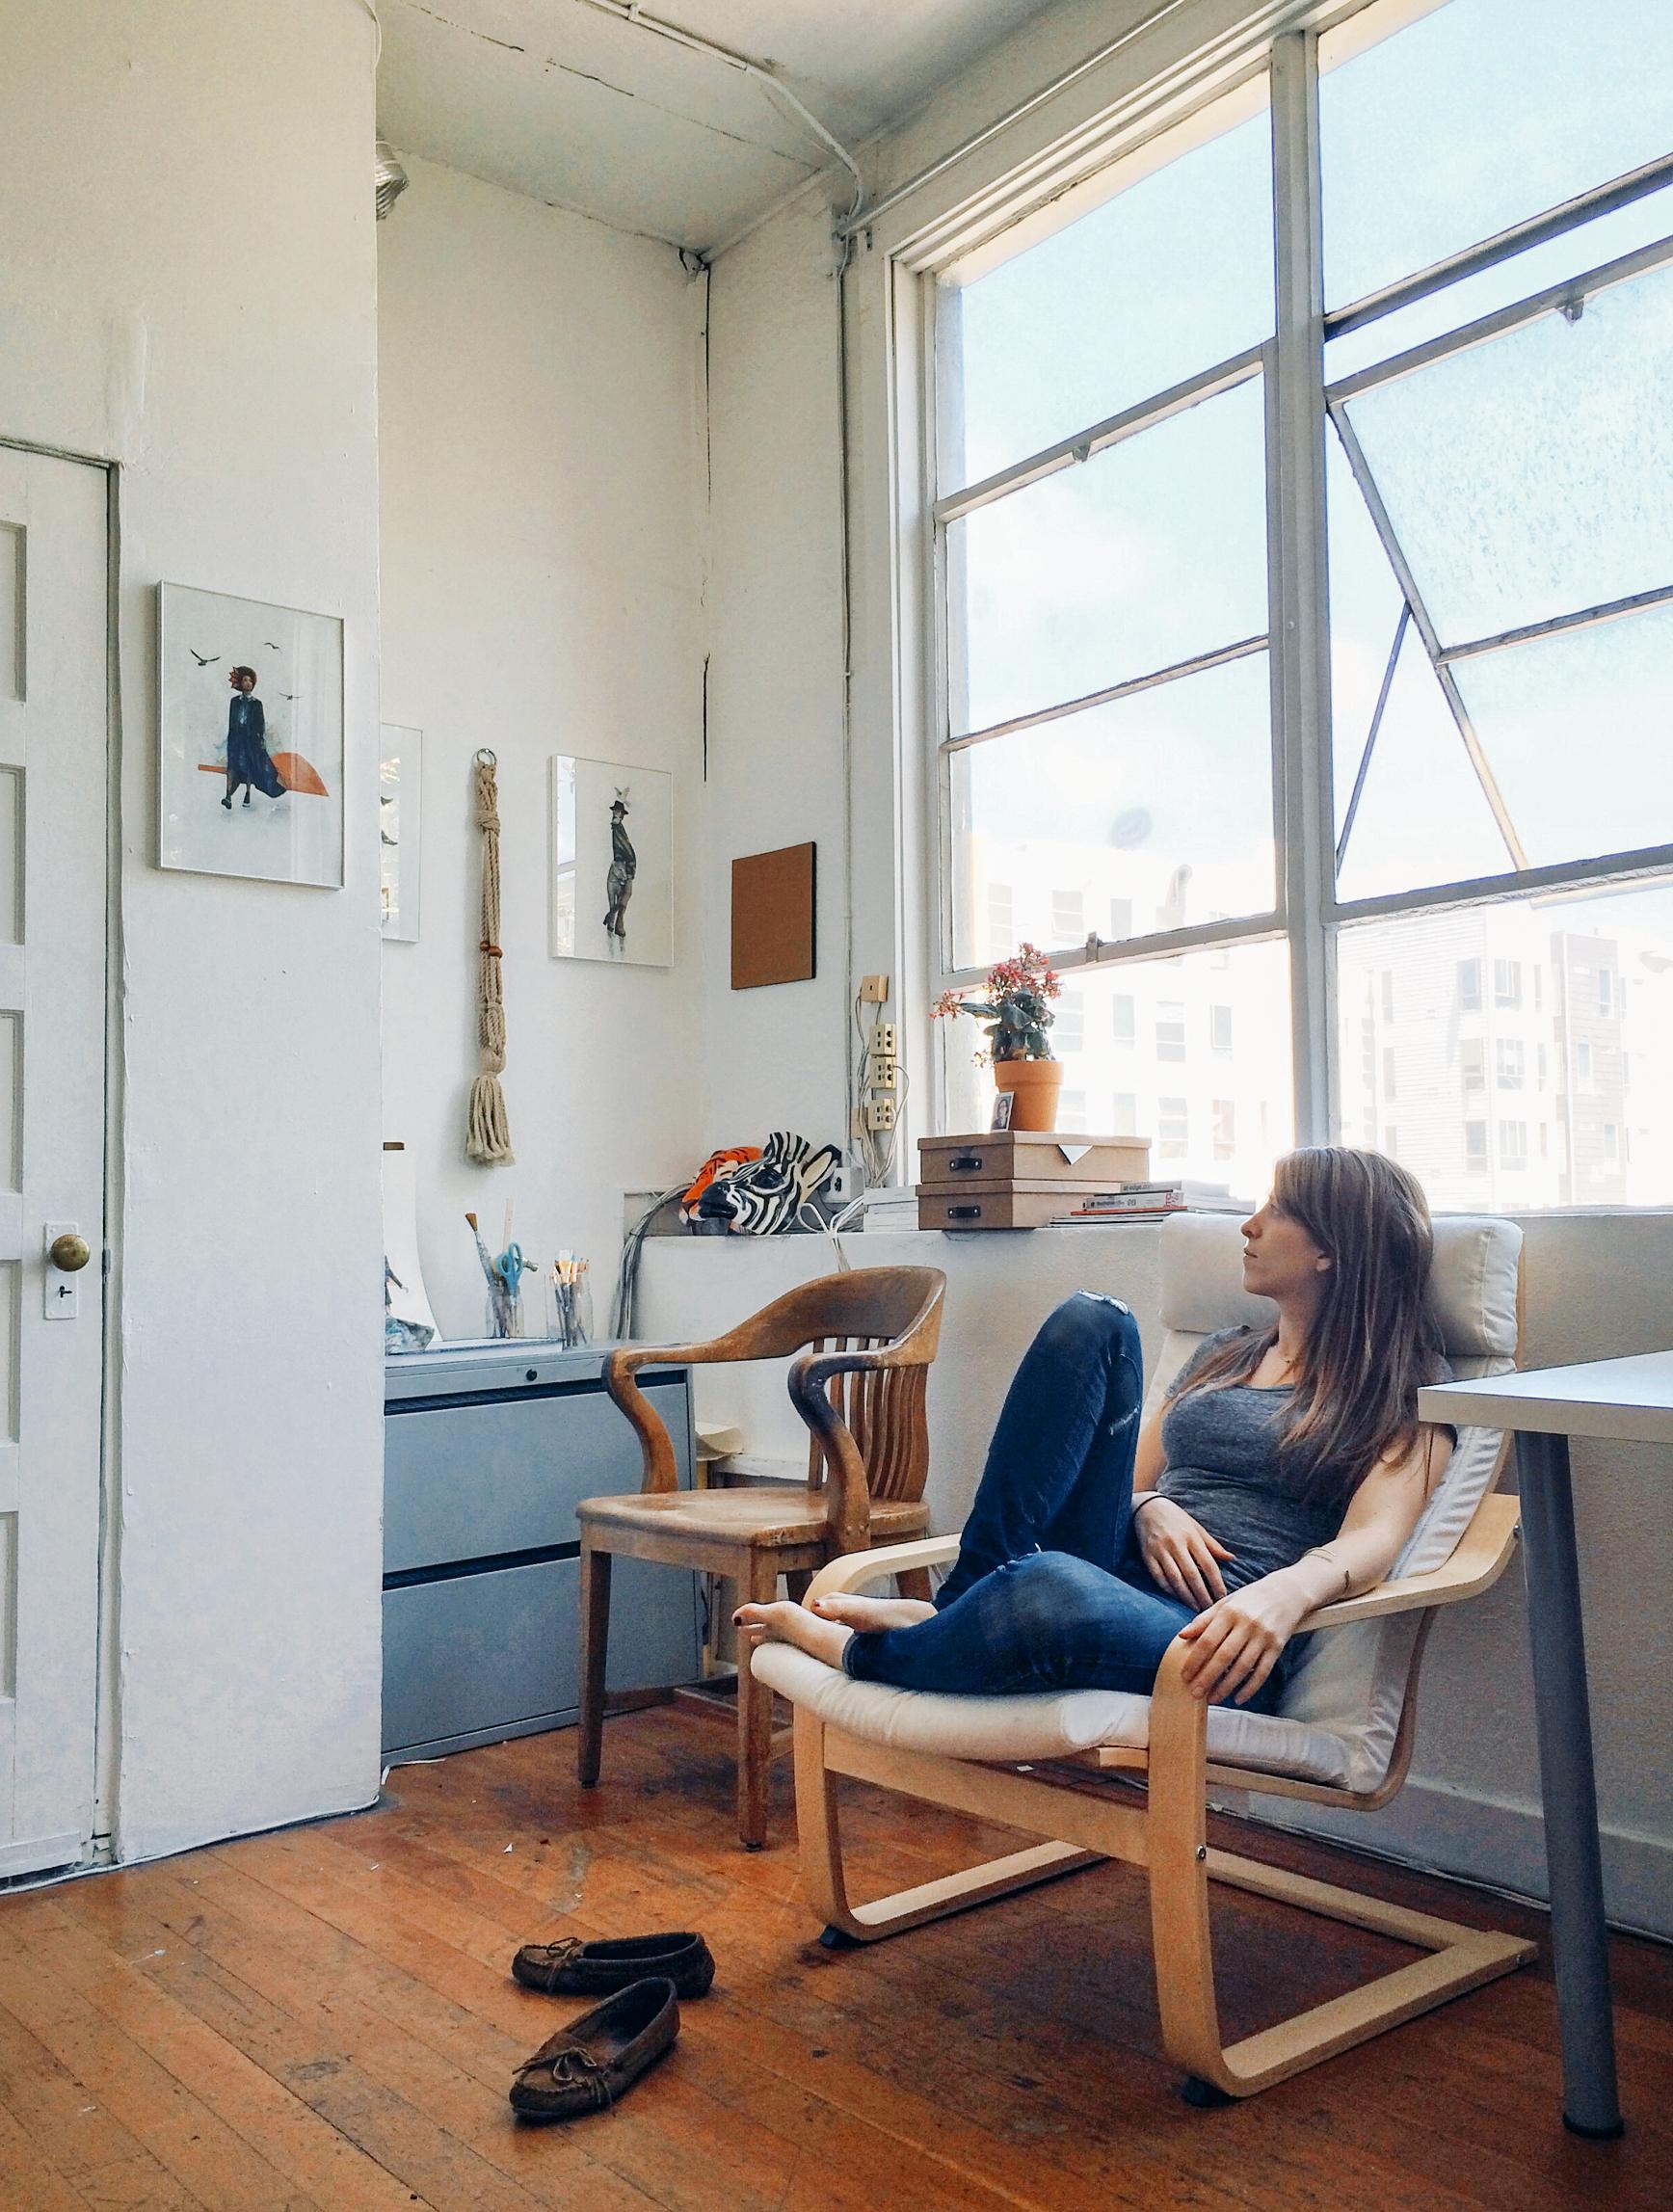 Pictured: my friend,  Casey , in her photo studio.